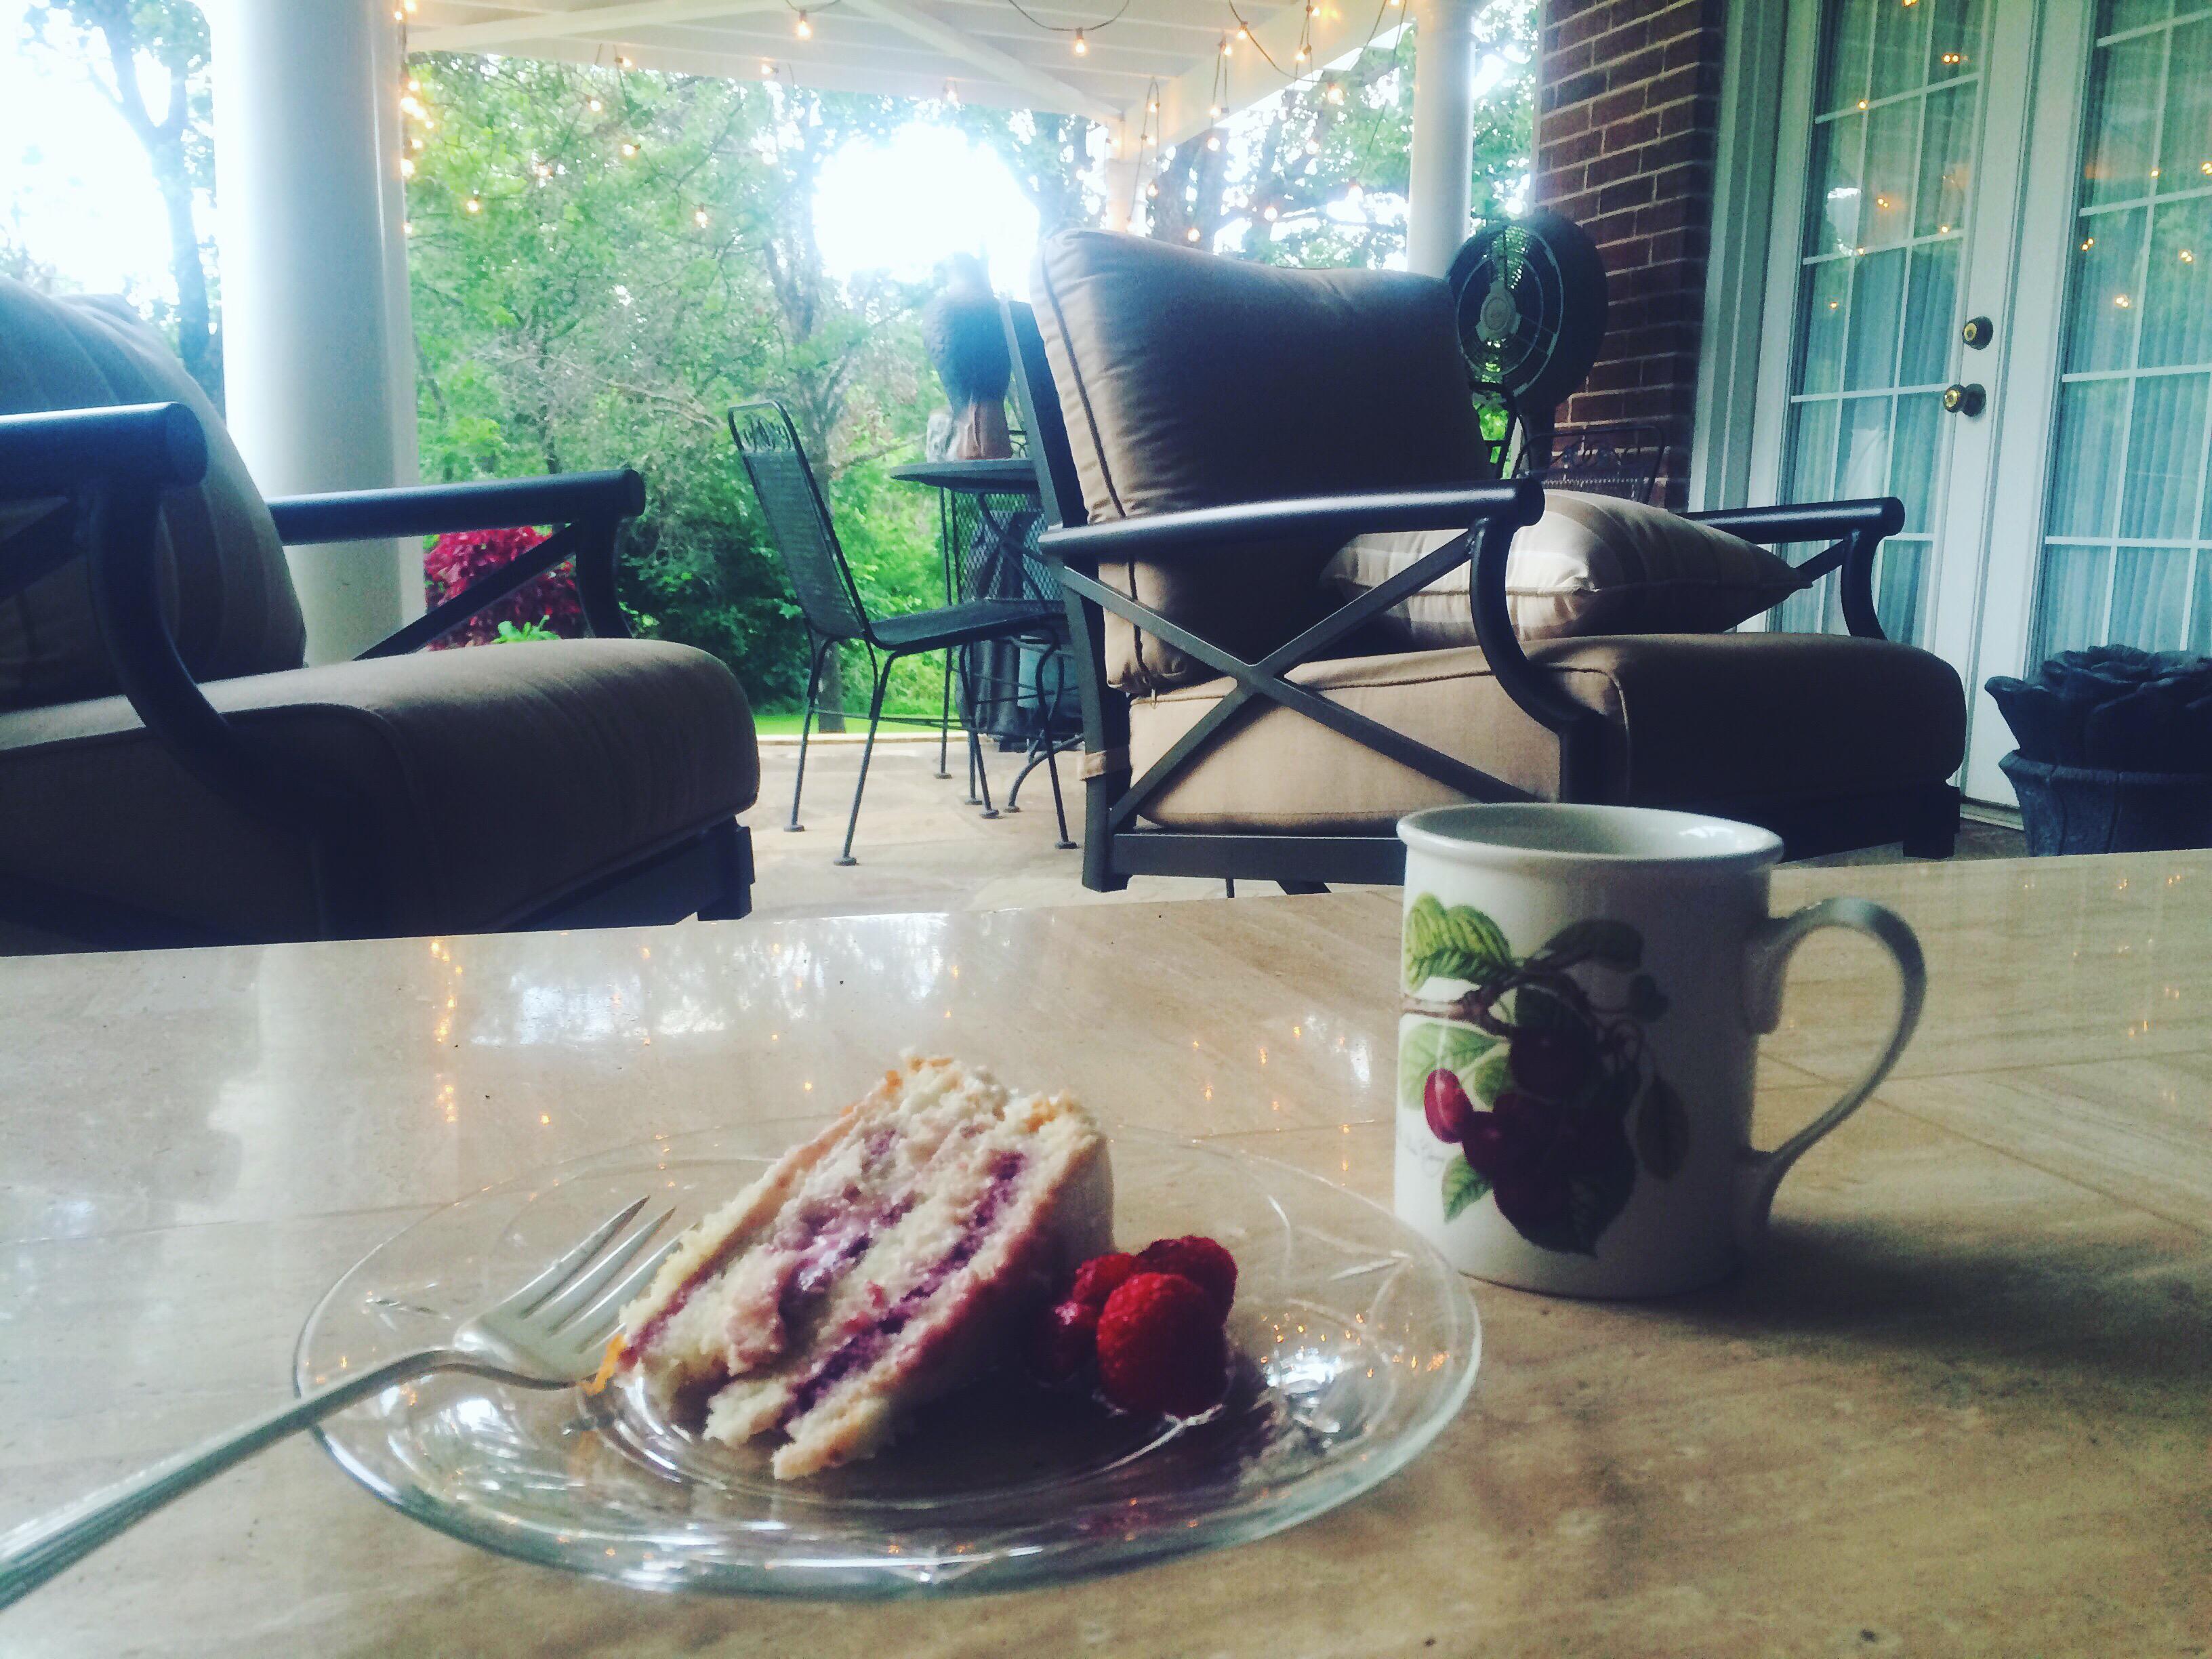 Coffee + Raspberry Cake on the Porch